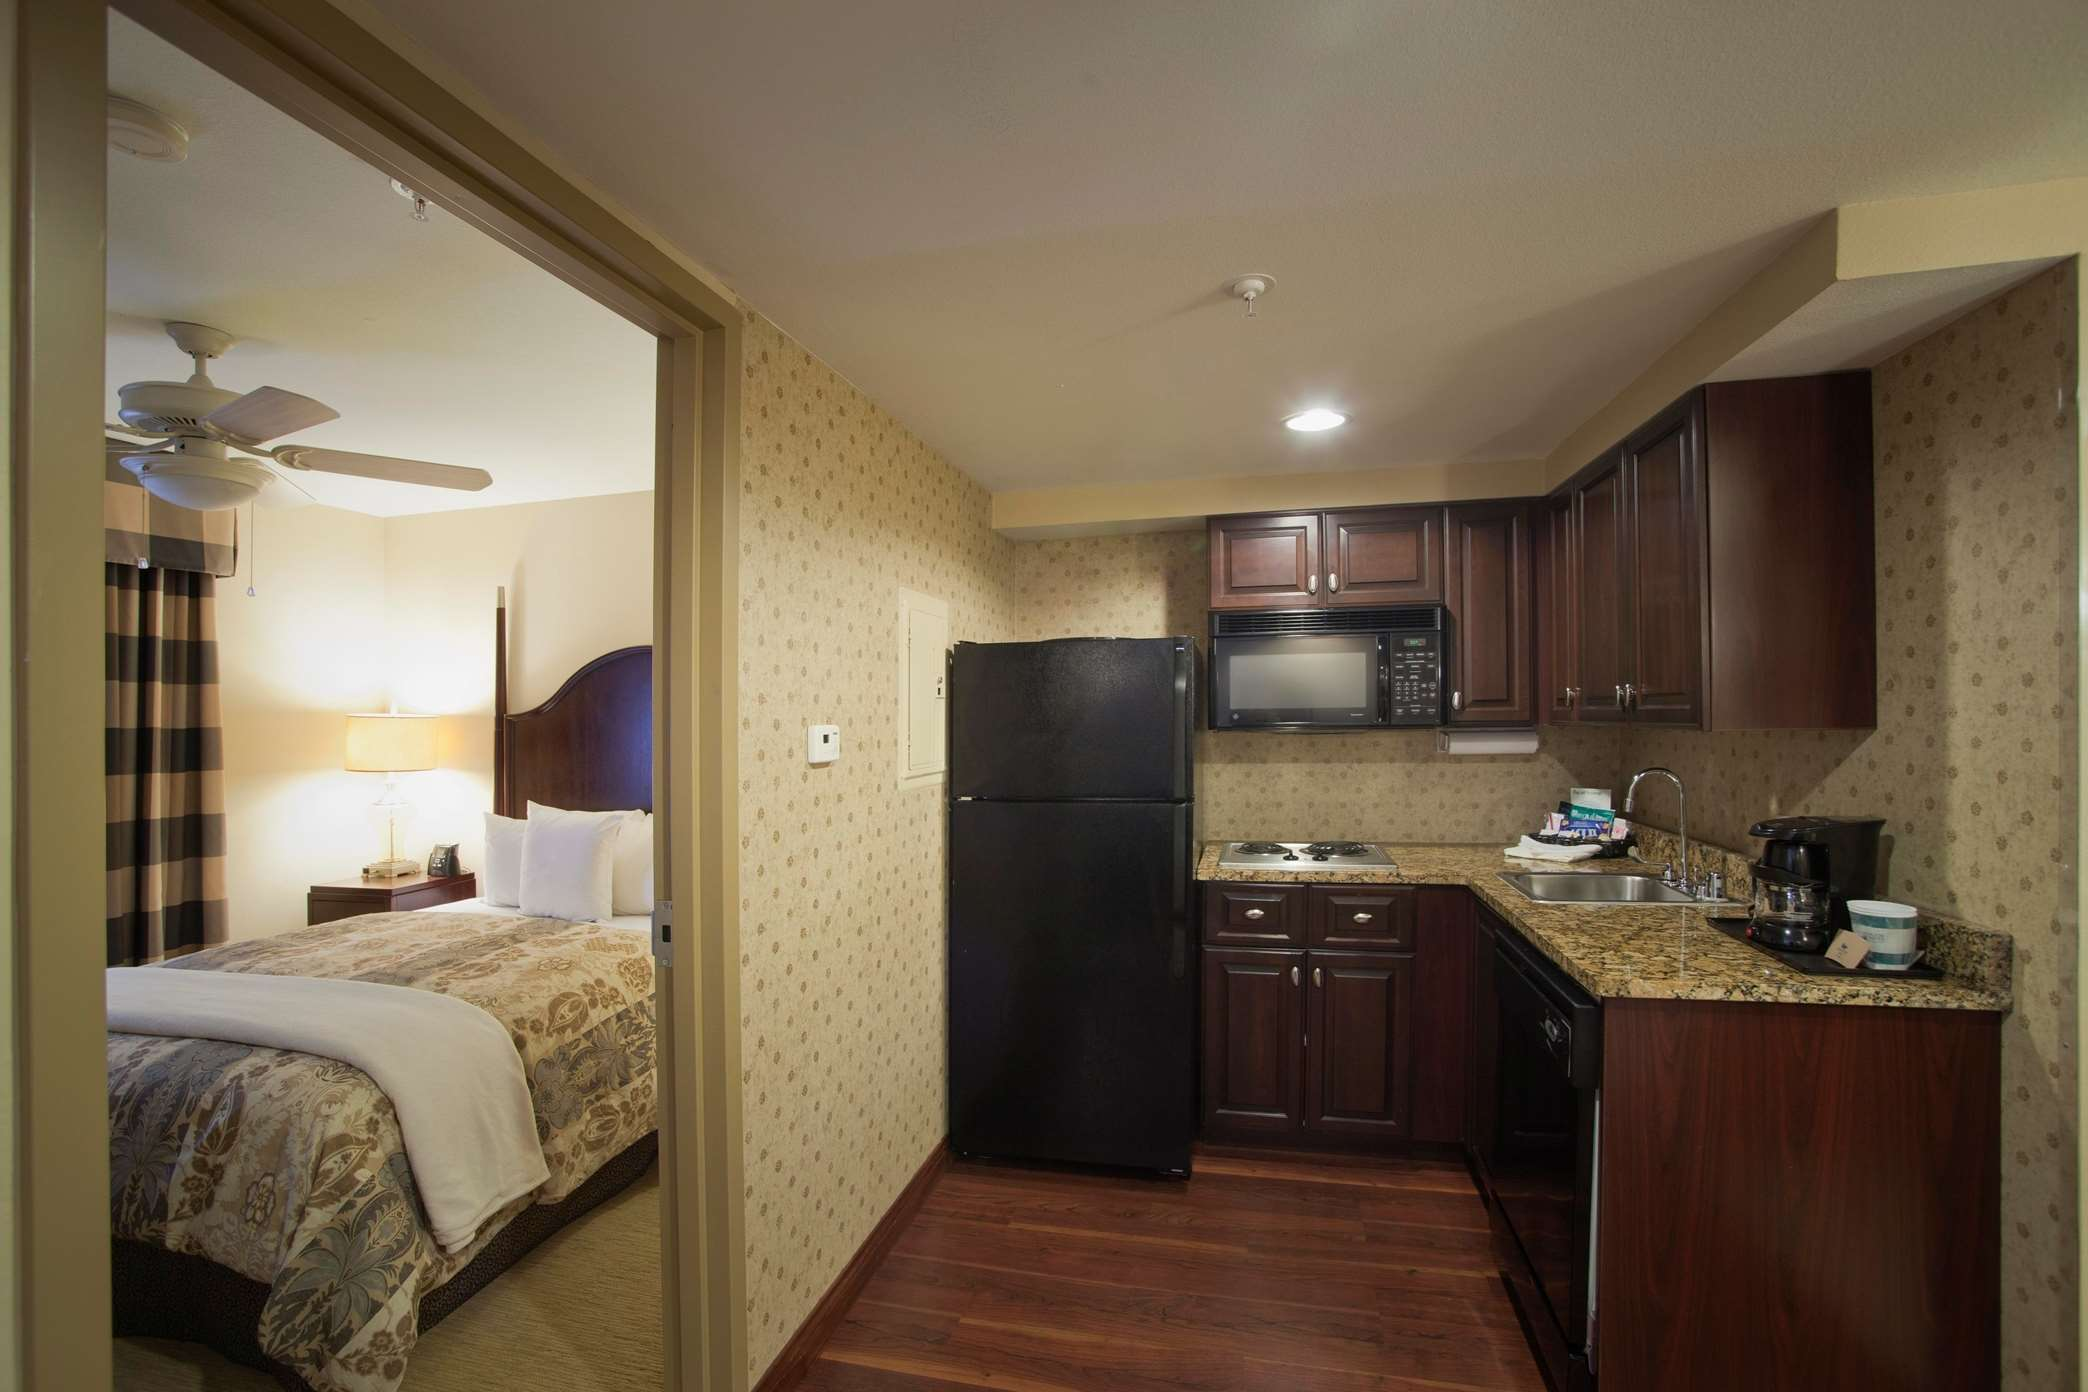 Homewood Suites by Hilton Albuquerque Airport image 3